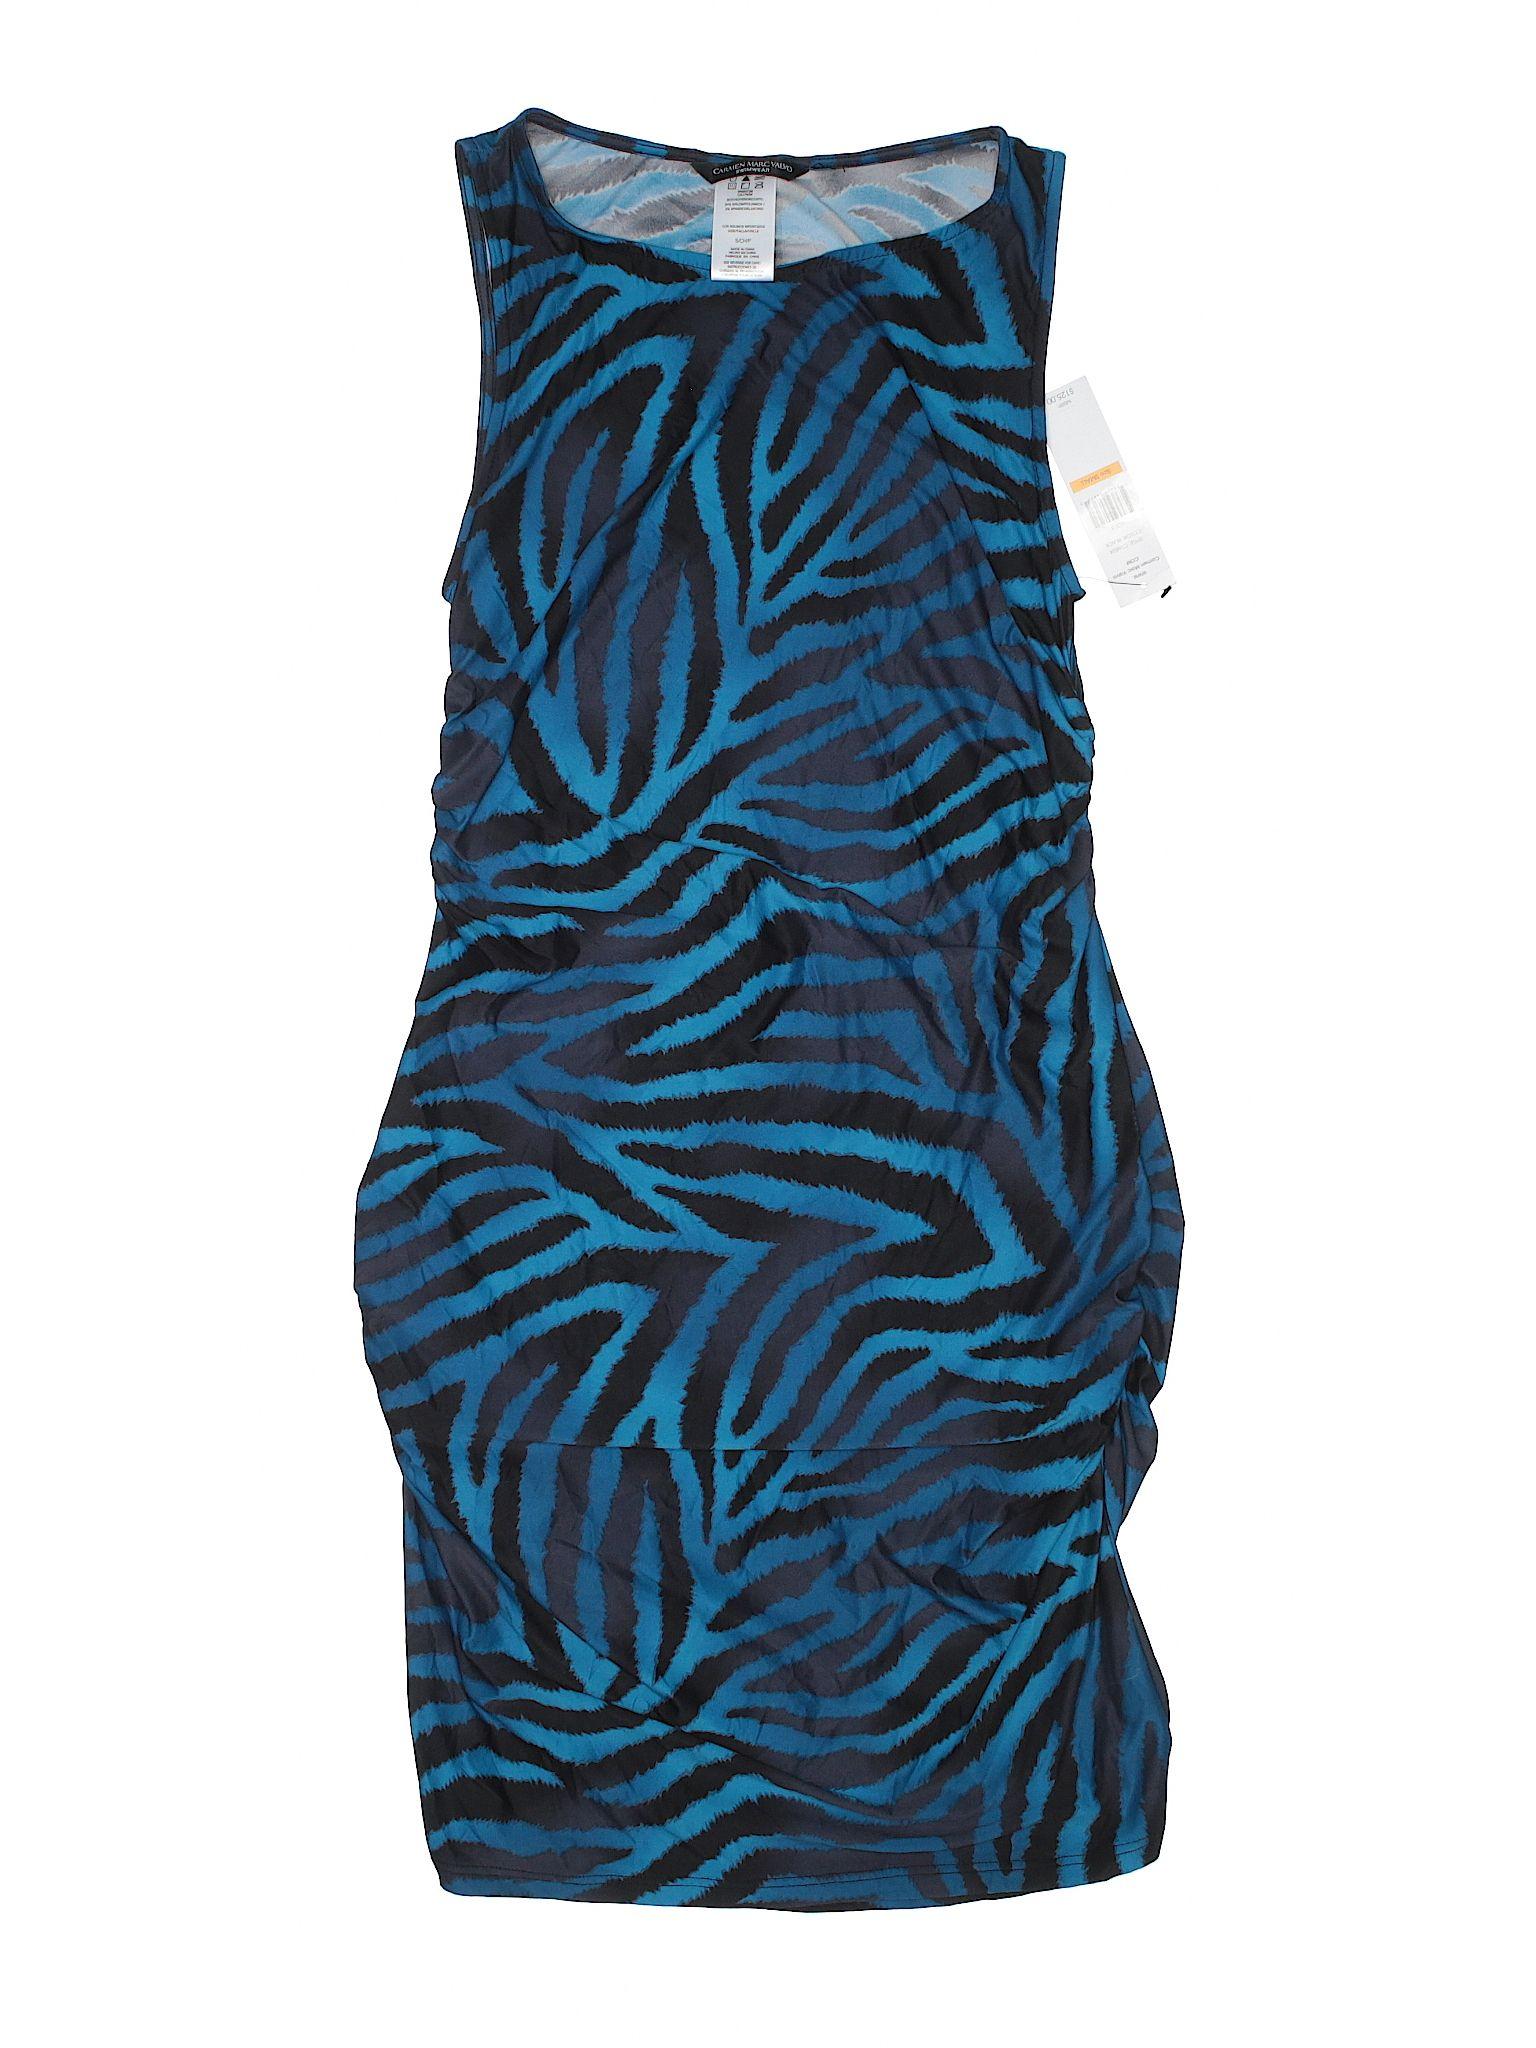 Carmen marc valvo swimsuit cover up size blue womenus swimwear